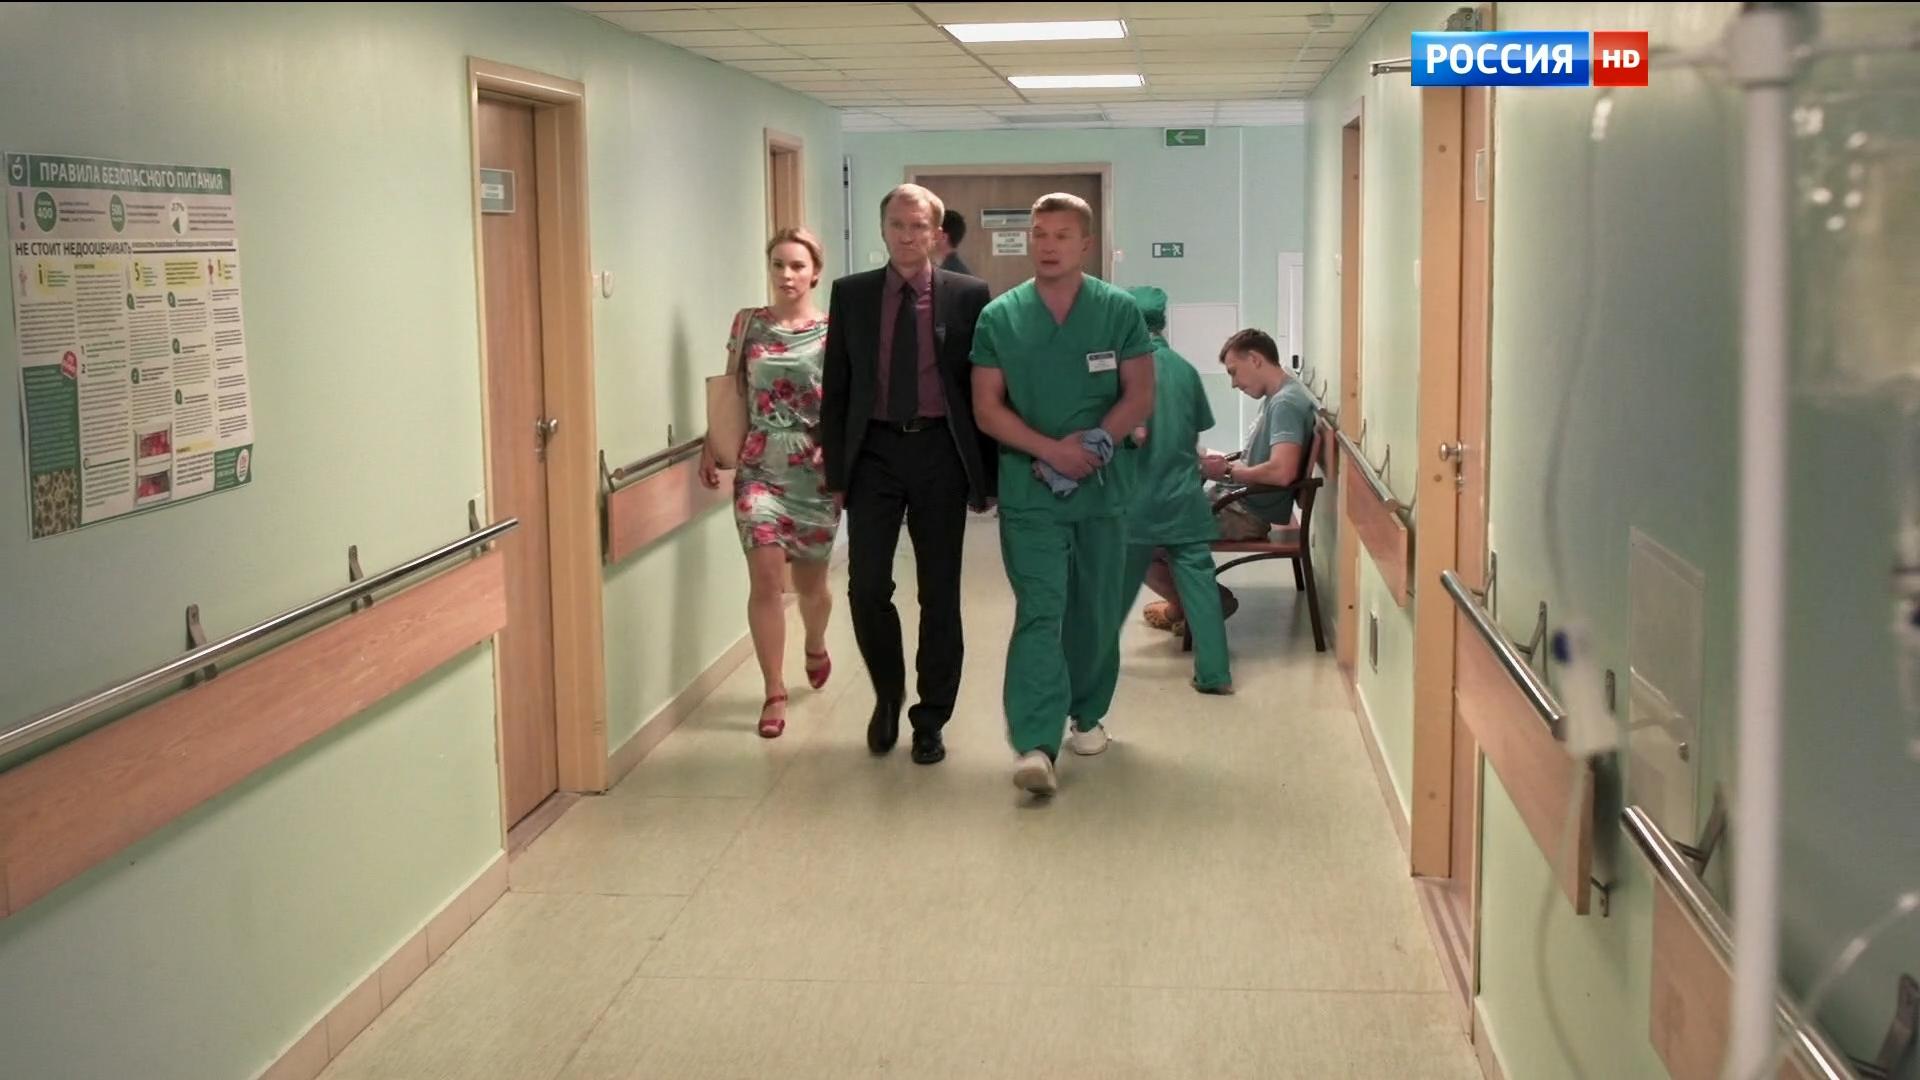 Чужое лицо 2015 HDTV 1080i.ts_snapshot_00.39.03_[2016.01.17_13.20.31].png